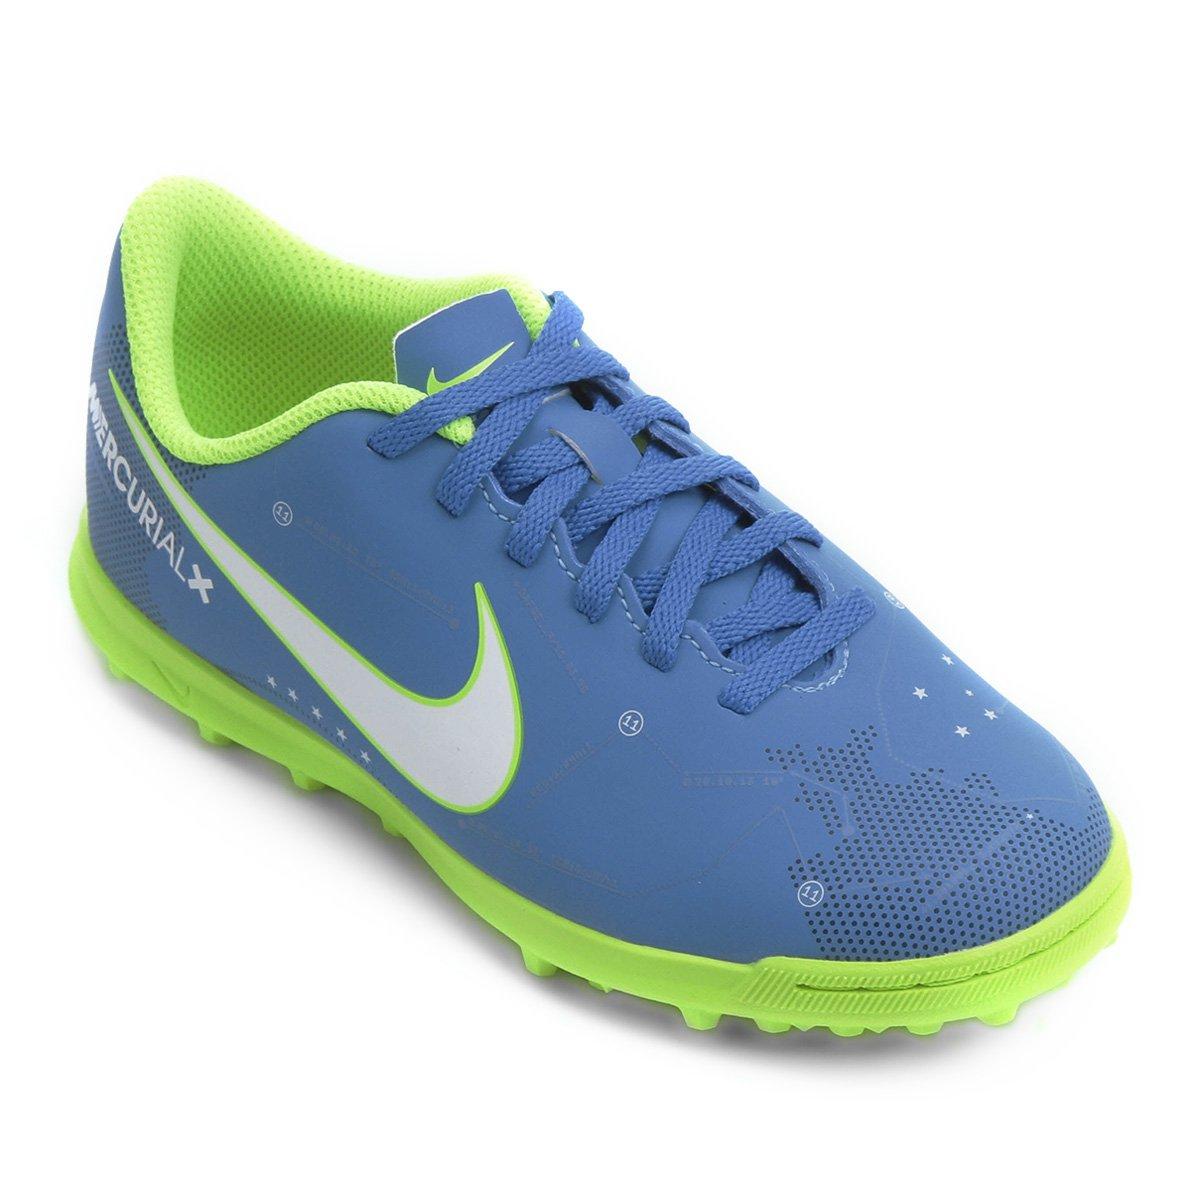 43d9537f0dedc Chuteira Society Infantil Nike Mercurial Vortex 3 Neymar Jr TF - Compre  Agora